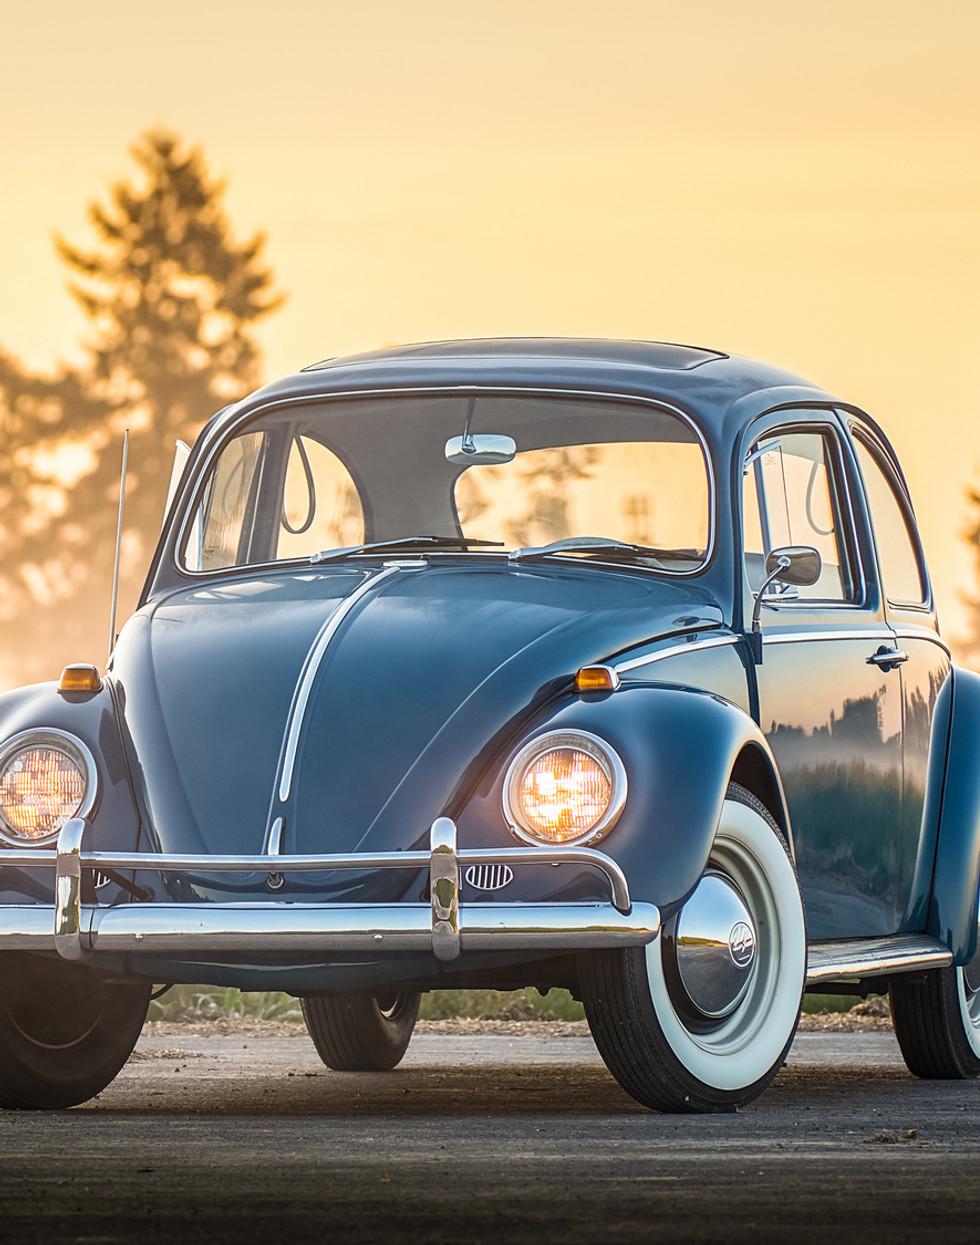 The Image Engine 1965 VW Beetle